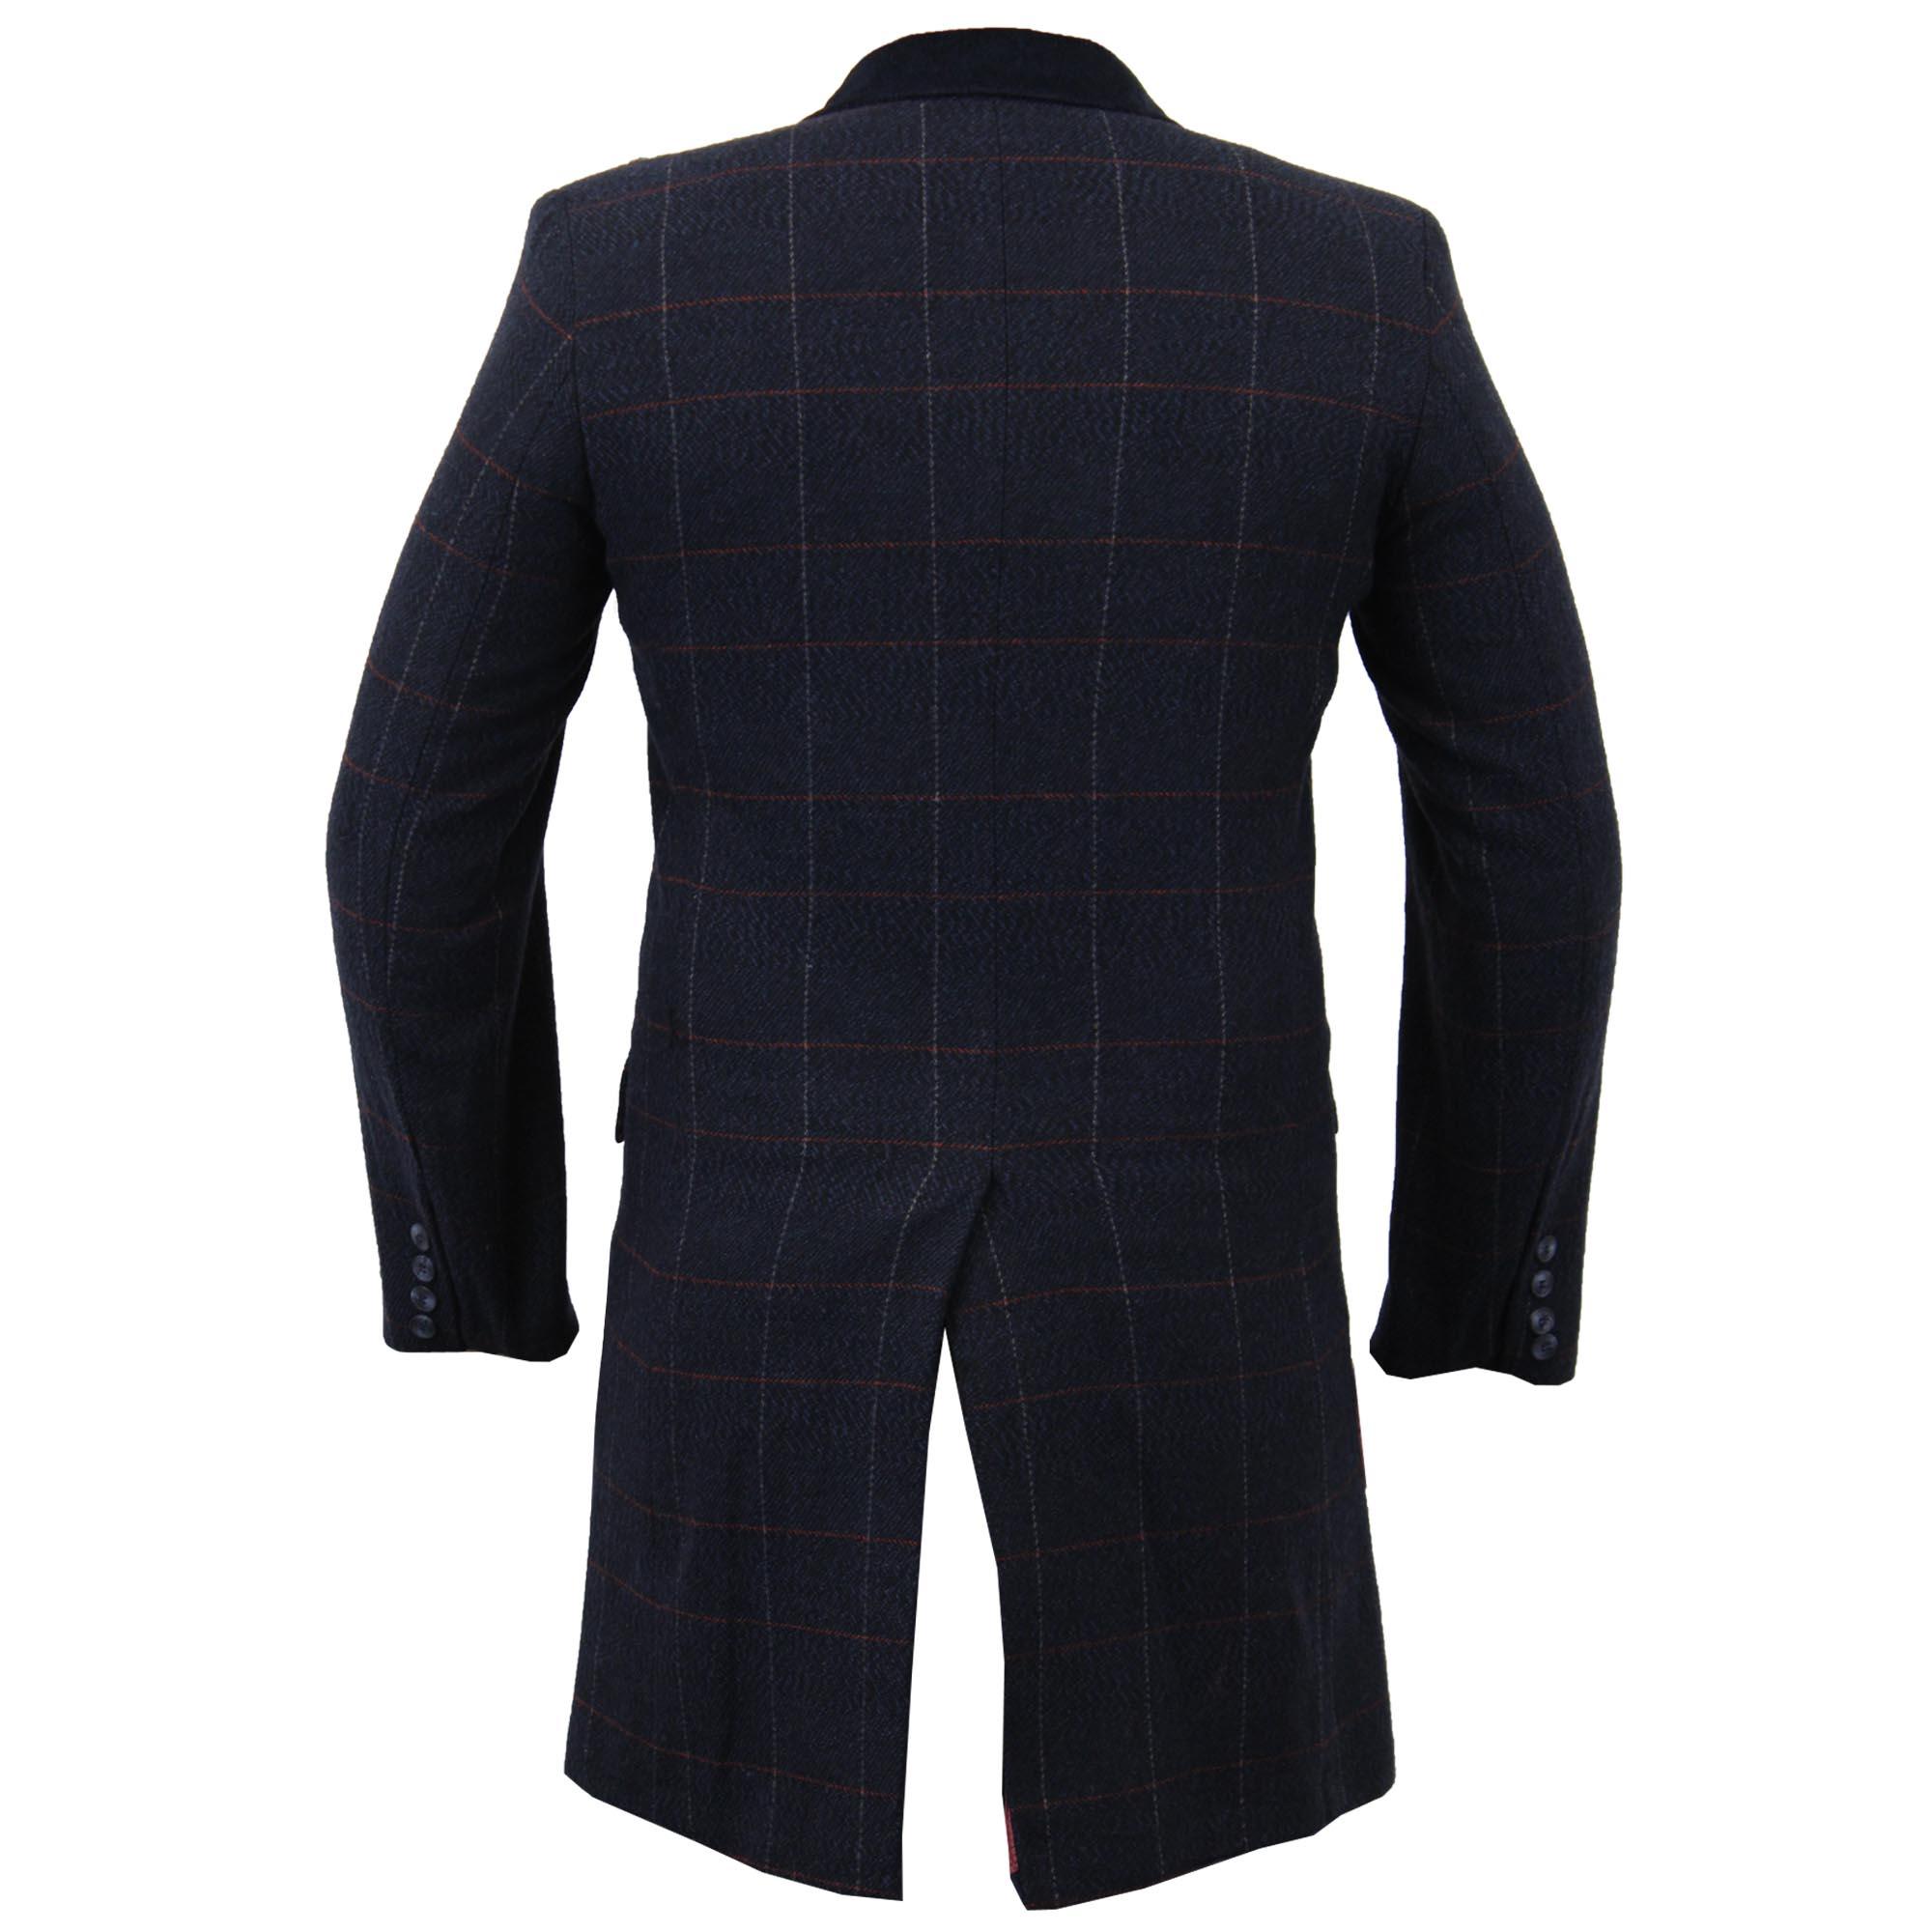 Mens-Wool-Mix-Trench-Coat-Checked-Jacket-Herringbone-Tweed-Overcoat-Lined-Winter thumbnail 11